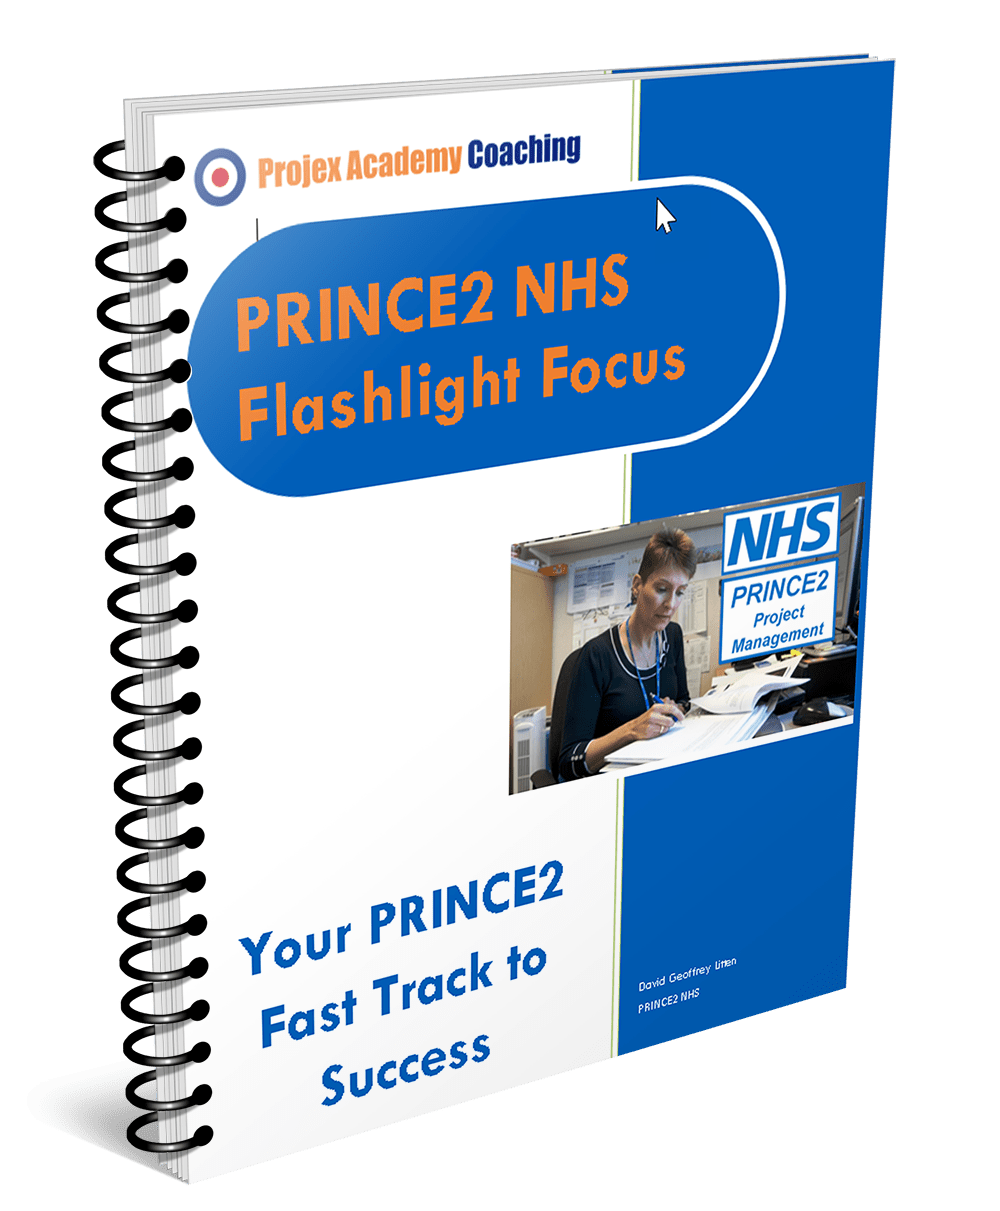 nhs_prince2_flashlight_focus_master